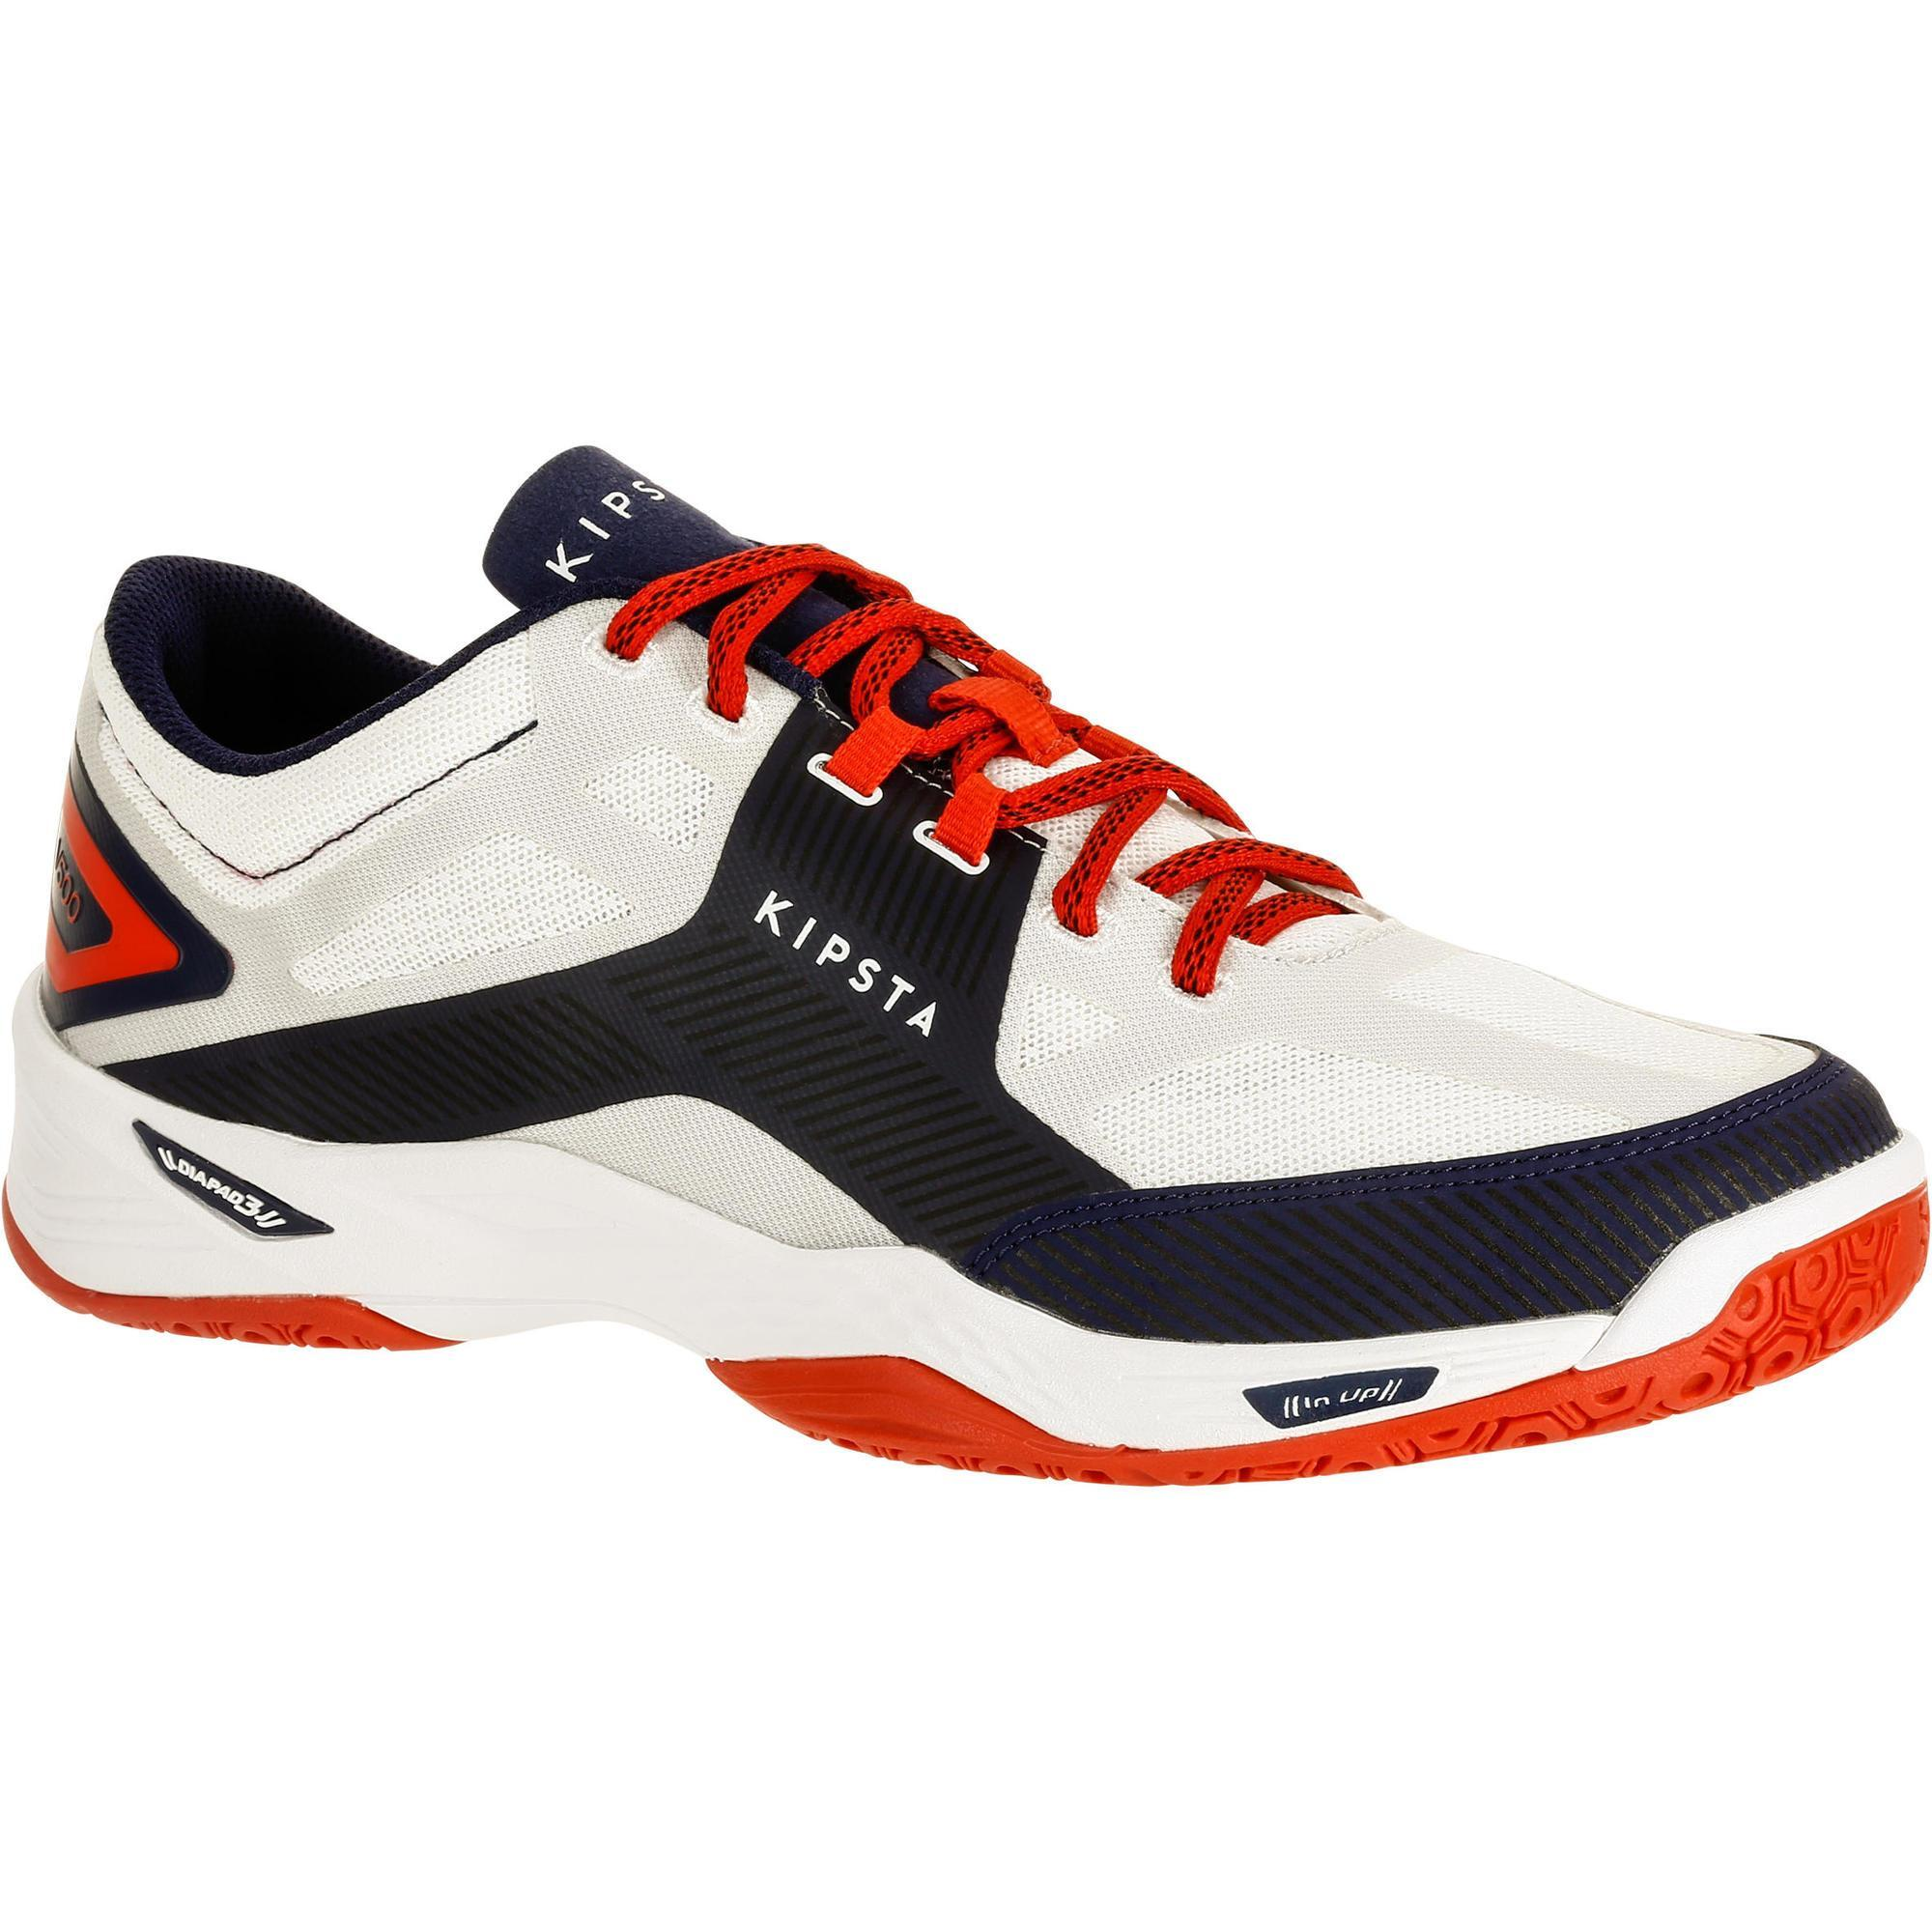 Allsix Volleybalschoenen heren V500 wit/blauw